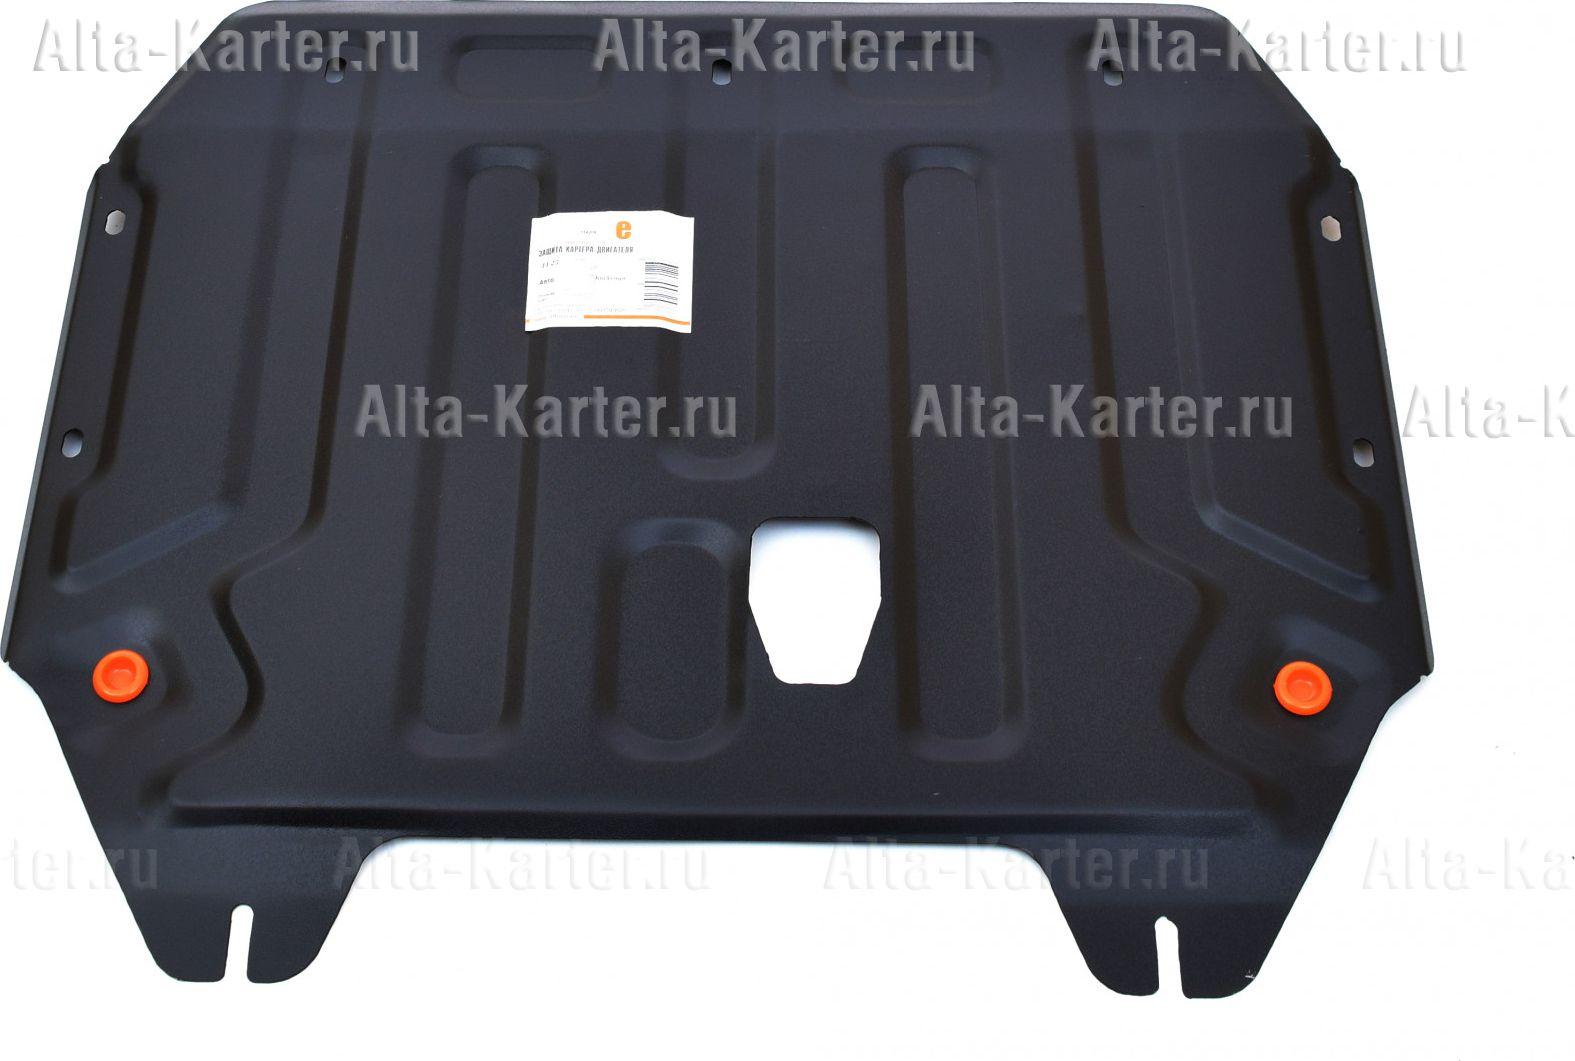 Защита Alfeco для картера и КПП Kia Venga 2010-2018. Артикул ALF.11.25